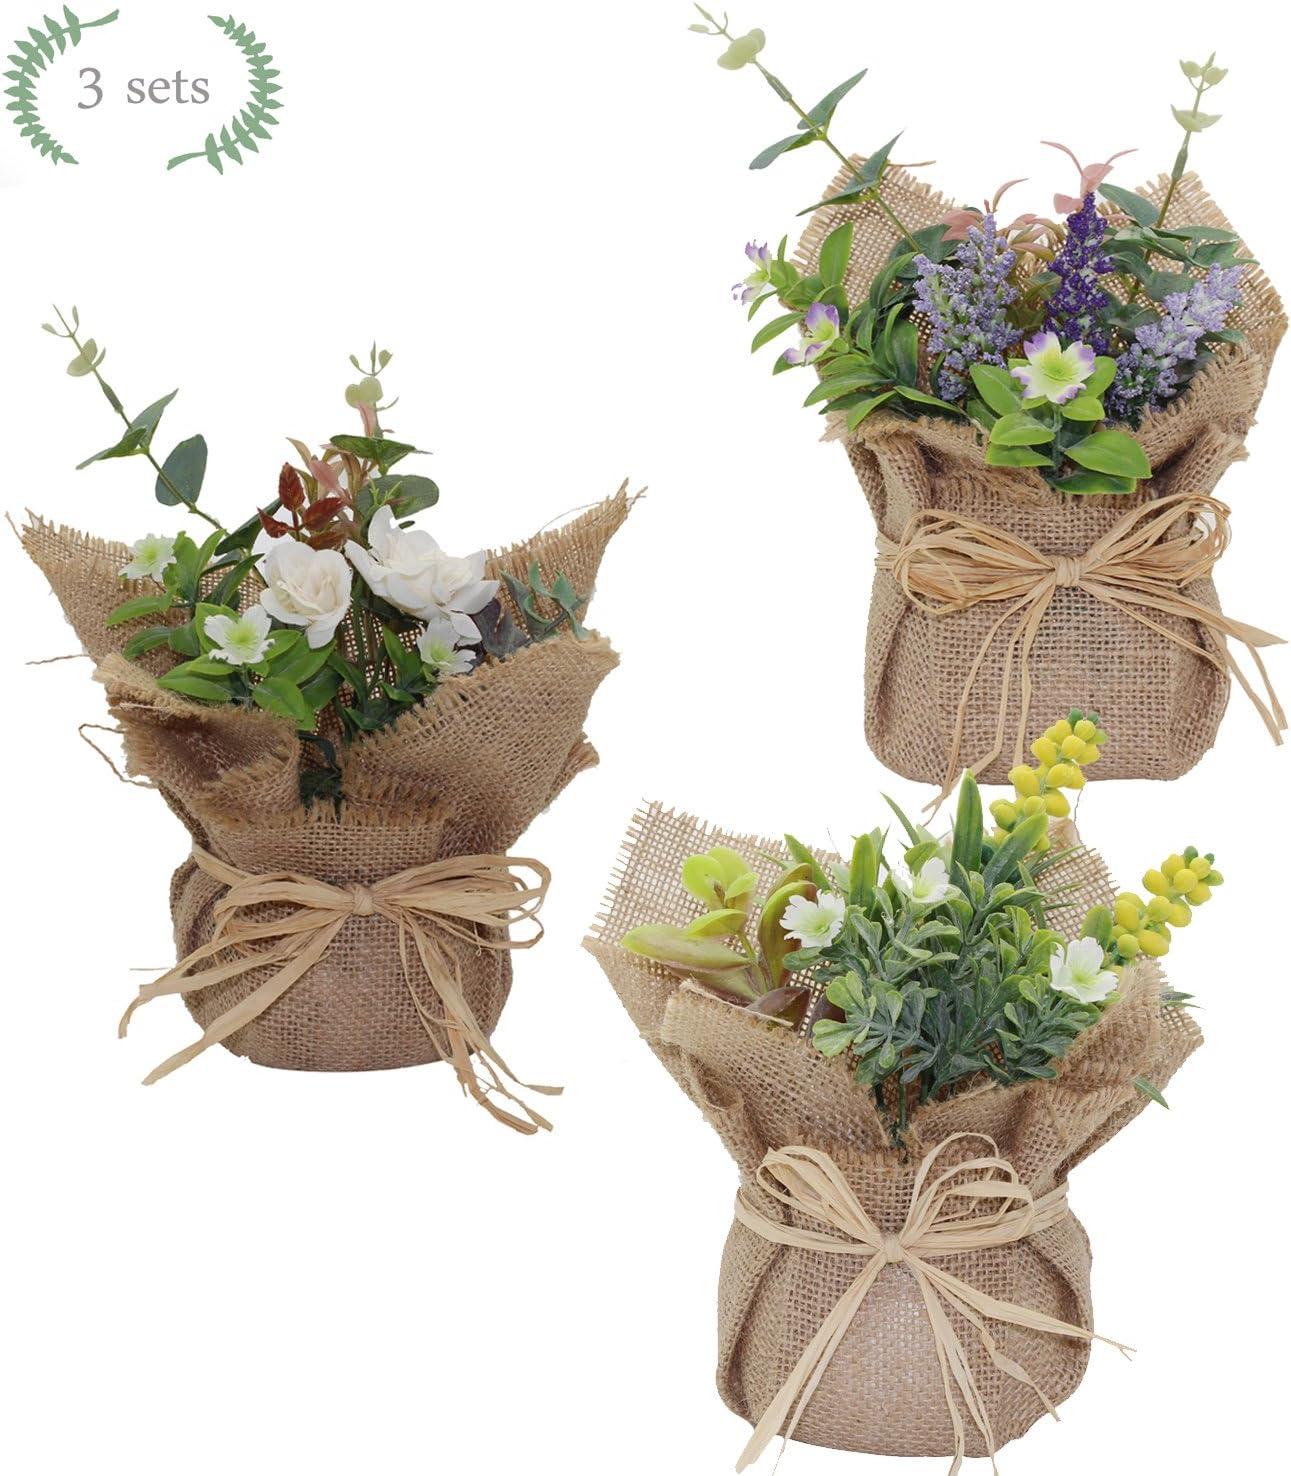 5 Sets, 7 Stems//Set Velener Artificial Silk Daisy Sunflowers Arrangements with Rattan Vase for Home Decor